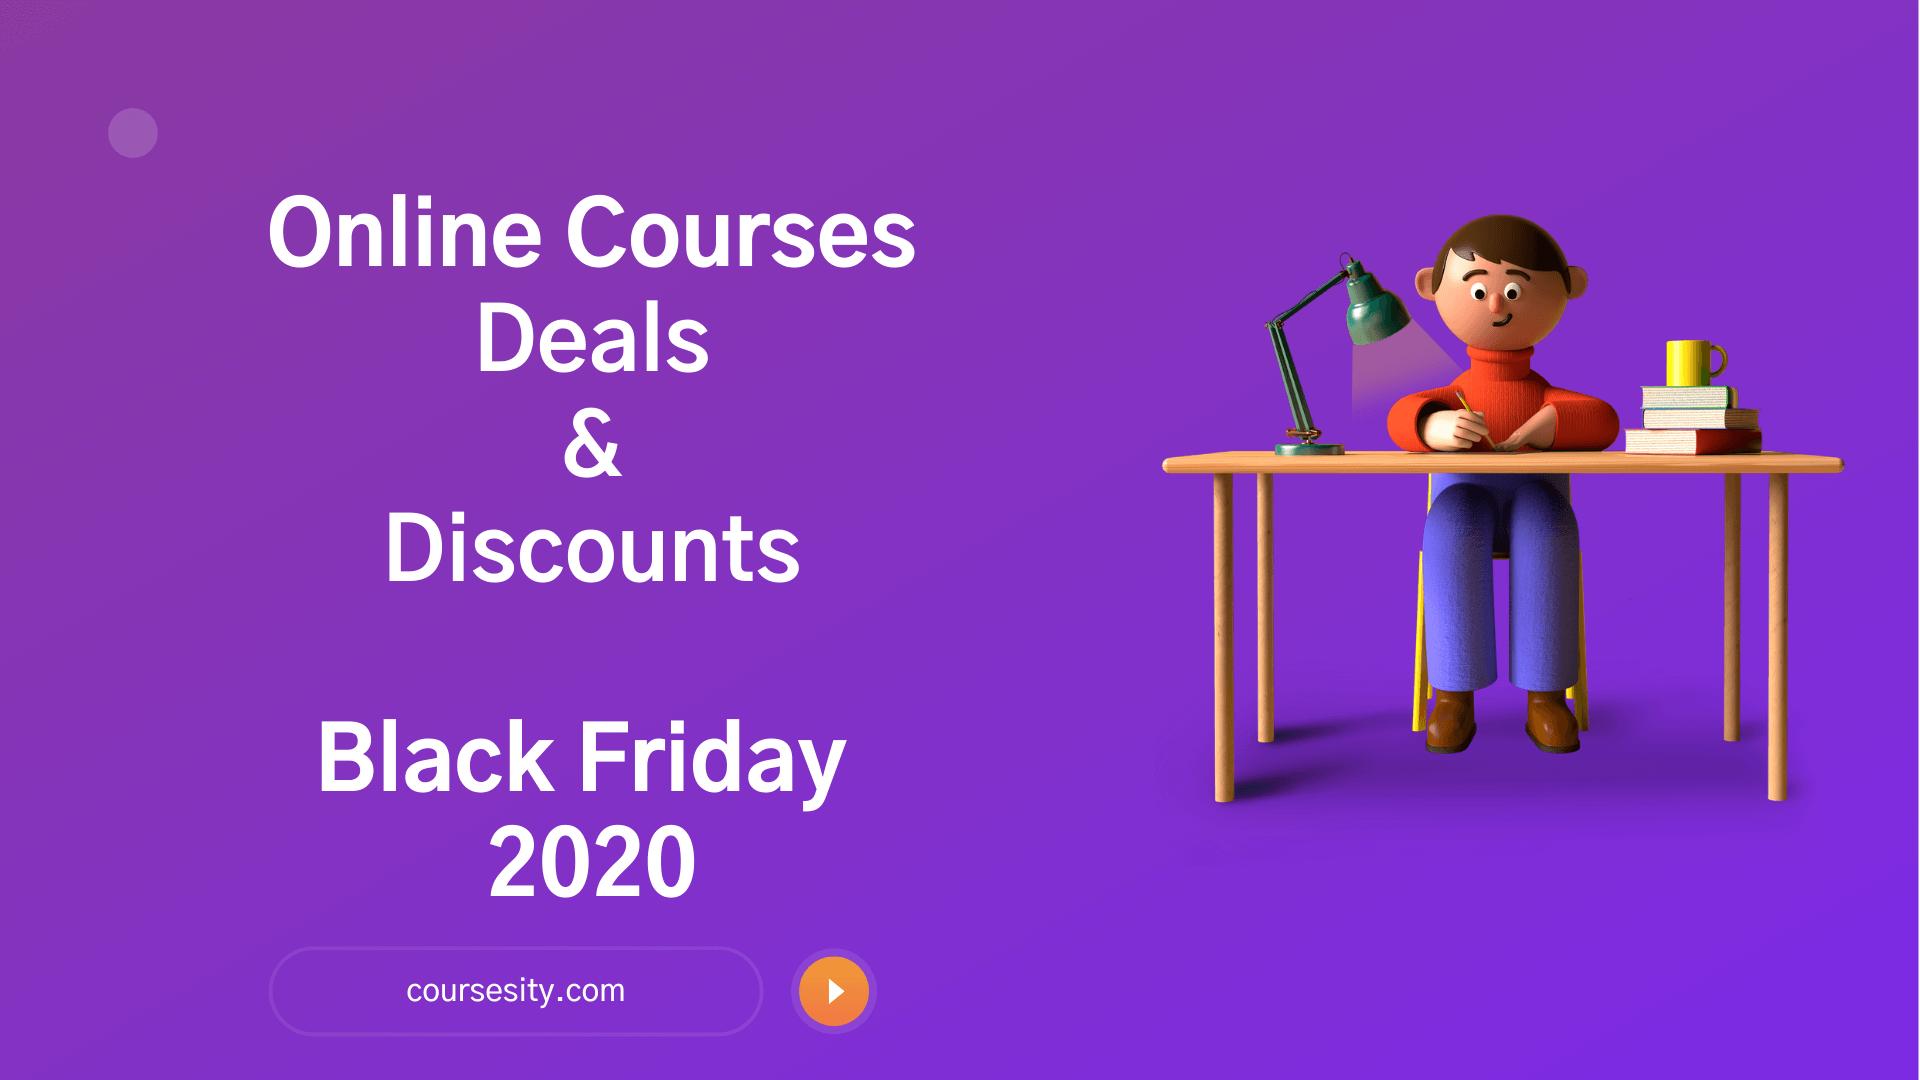 10 Online Courses Deals: Black Friday Discounts & Coupons 2020